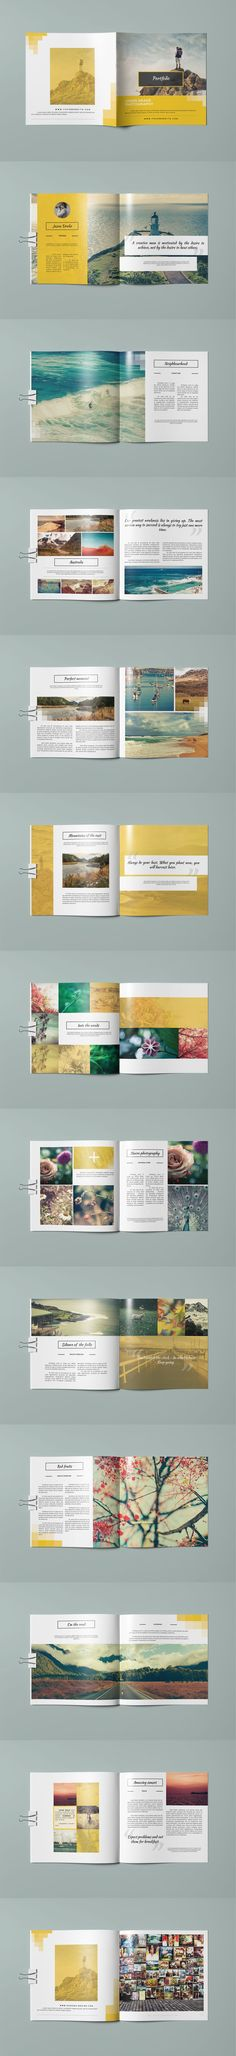 Portfolio Square Modern Catalog / Brochure 24 Pages Template InDesign INDD